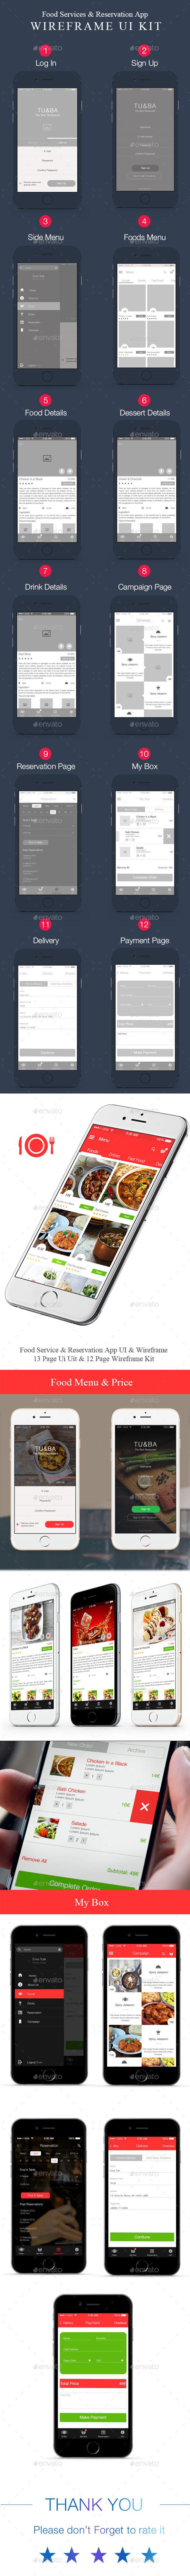 Food App UI & Wireframe Kit - User Interfaces Web Elements